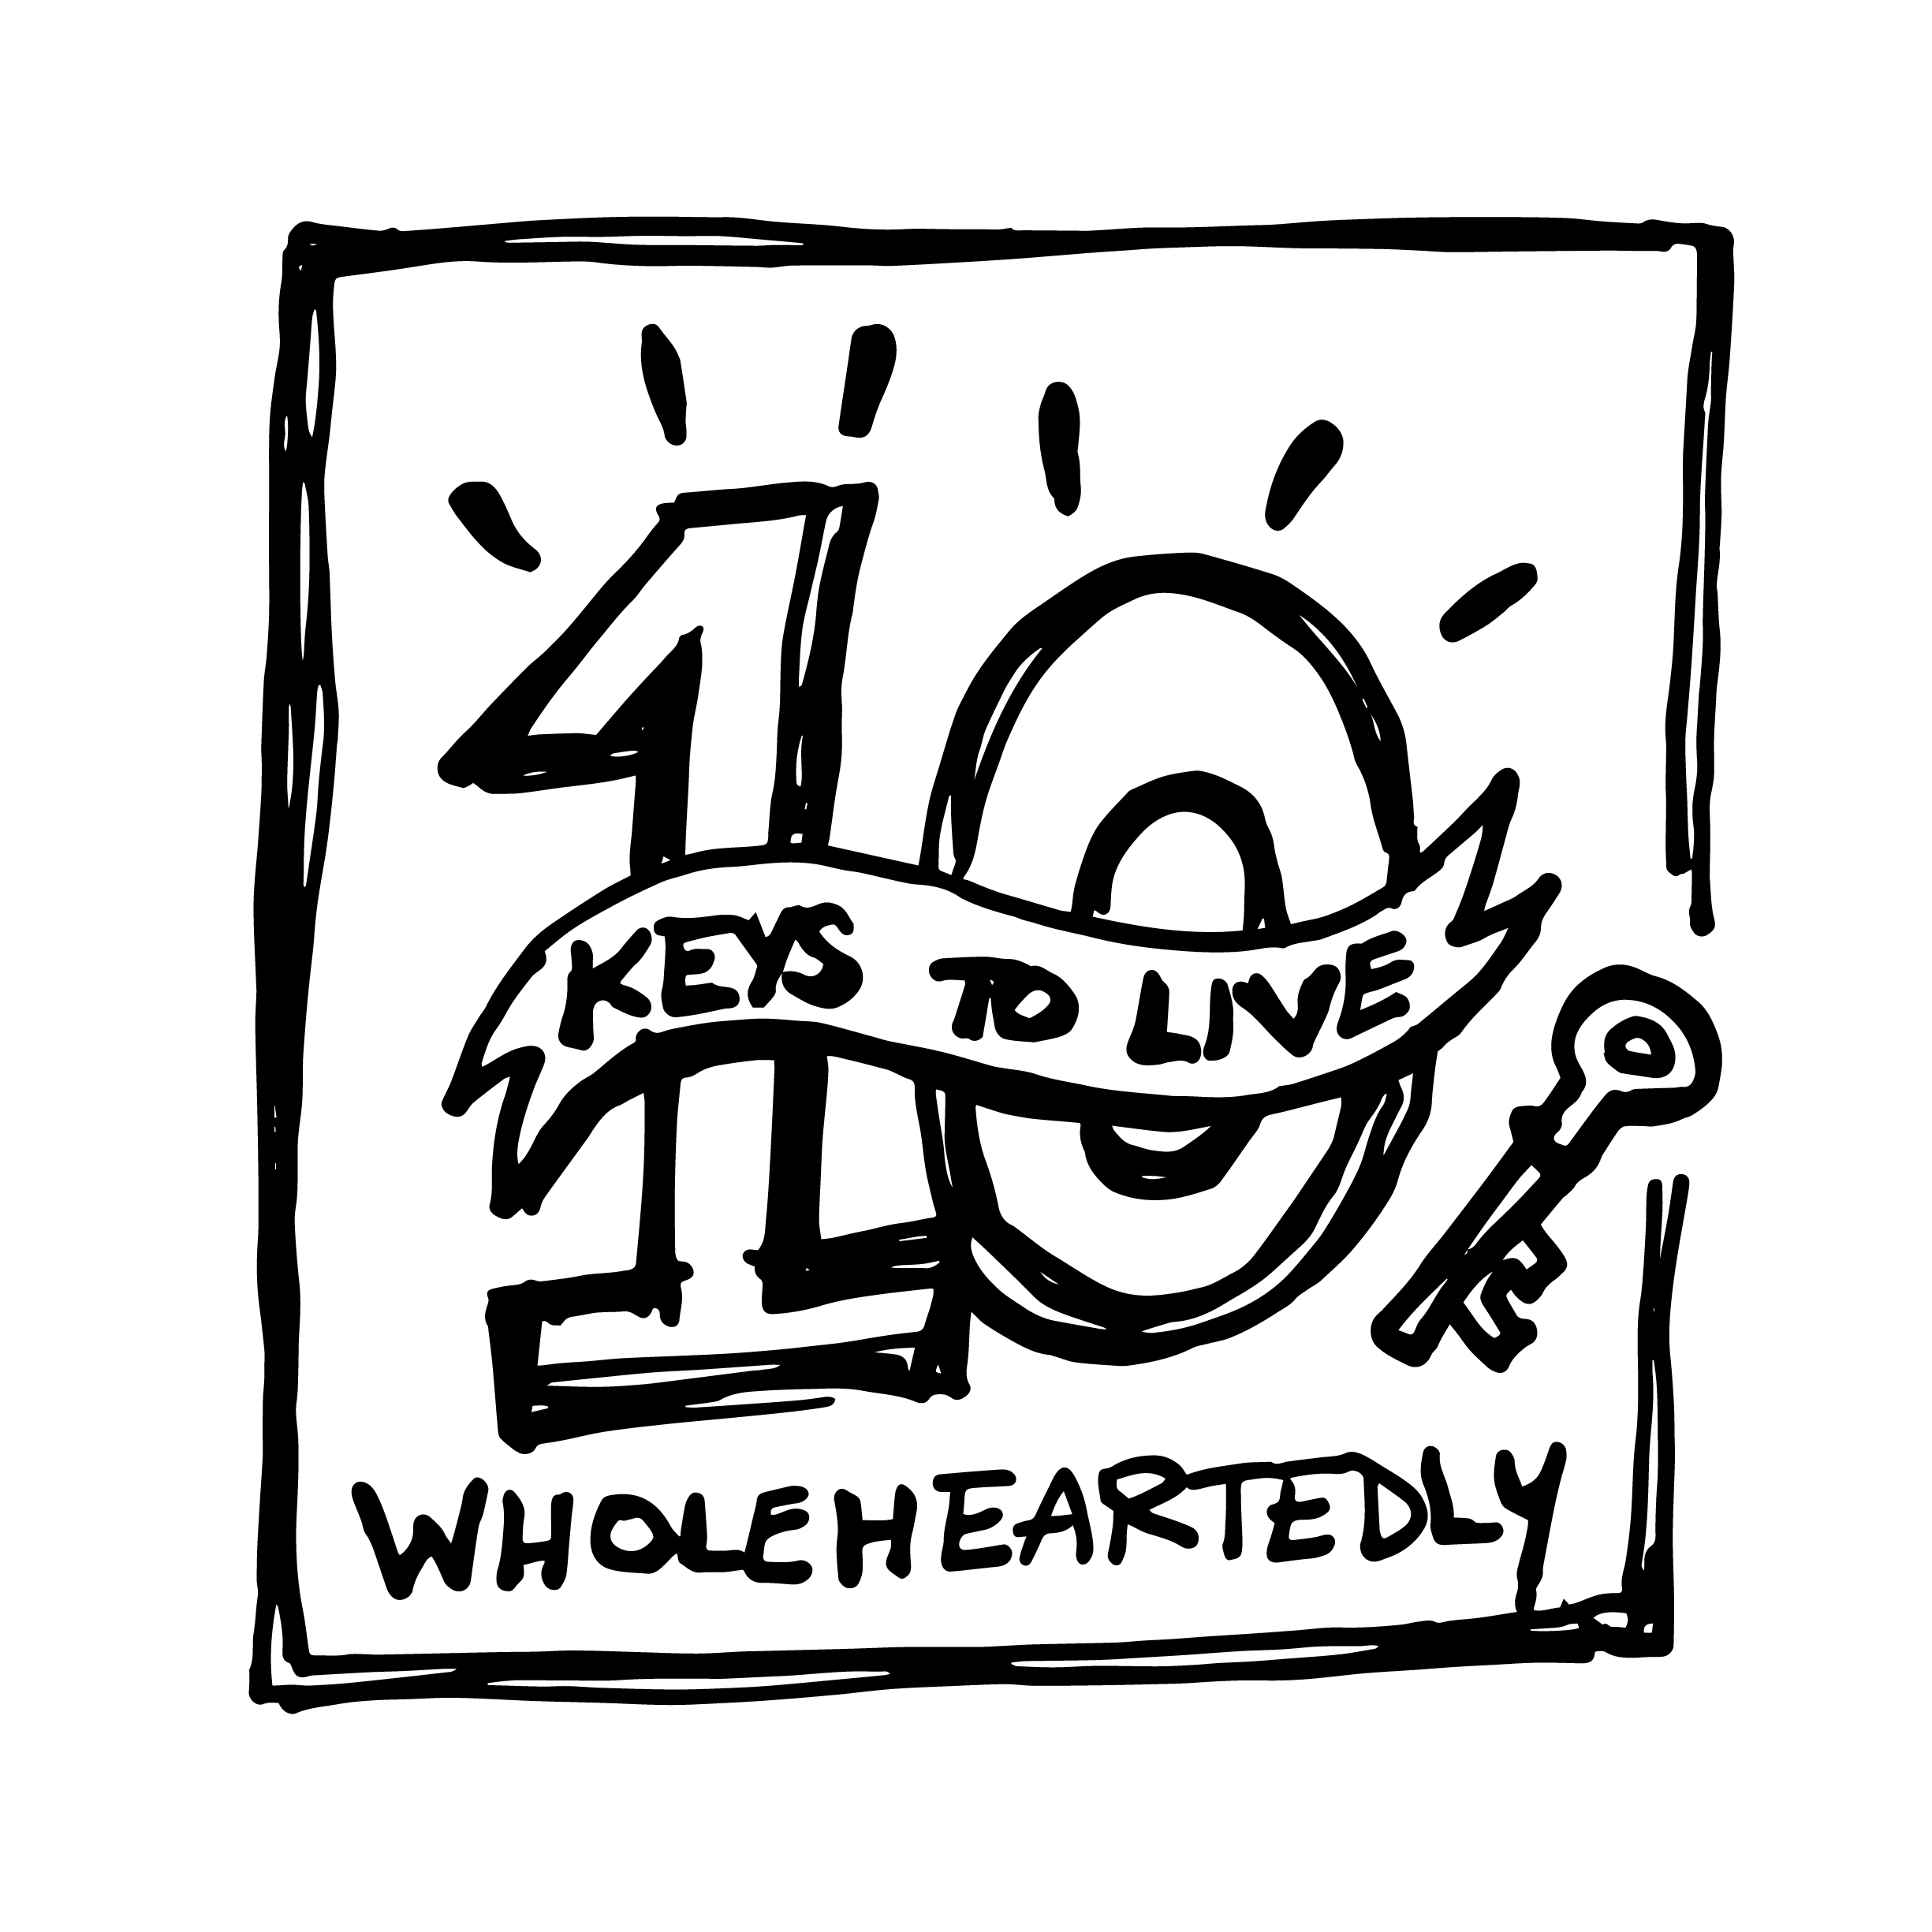 10 Keys to Live Wholeheartedly